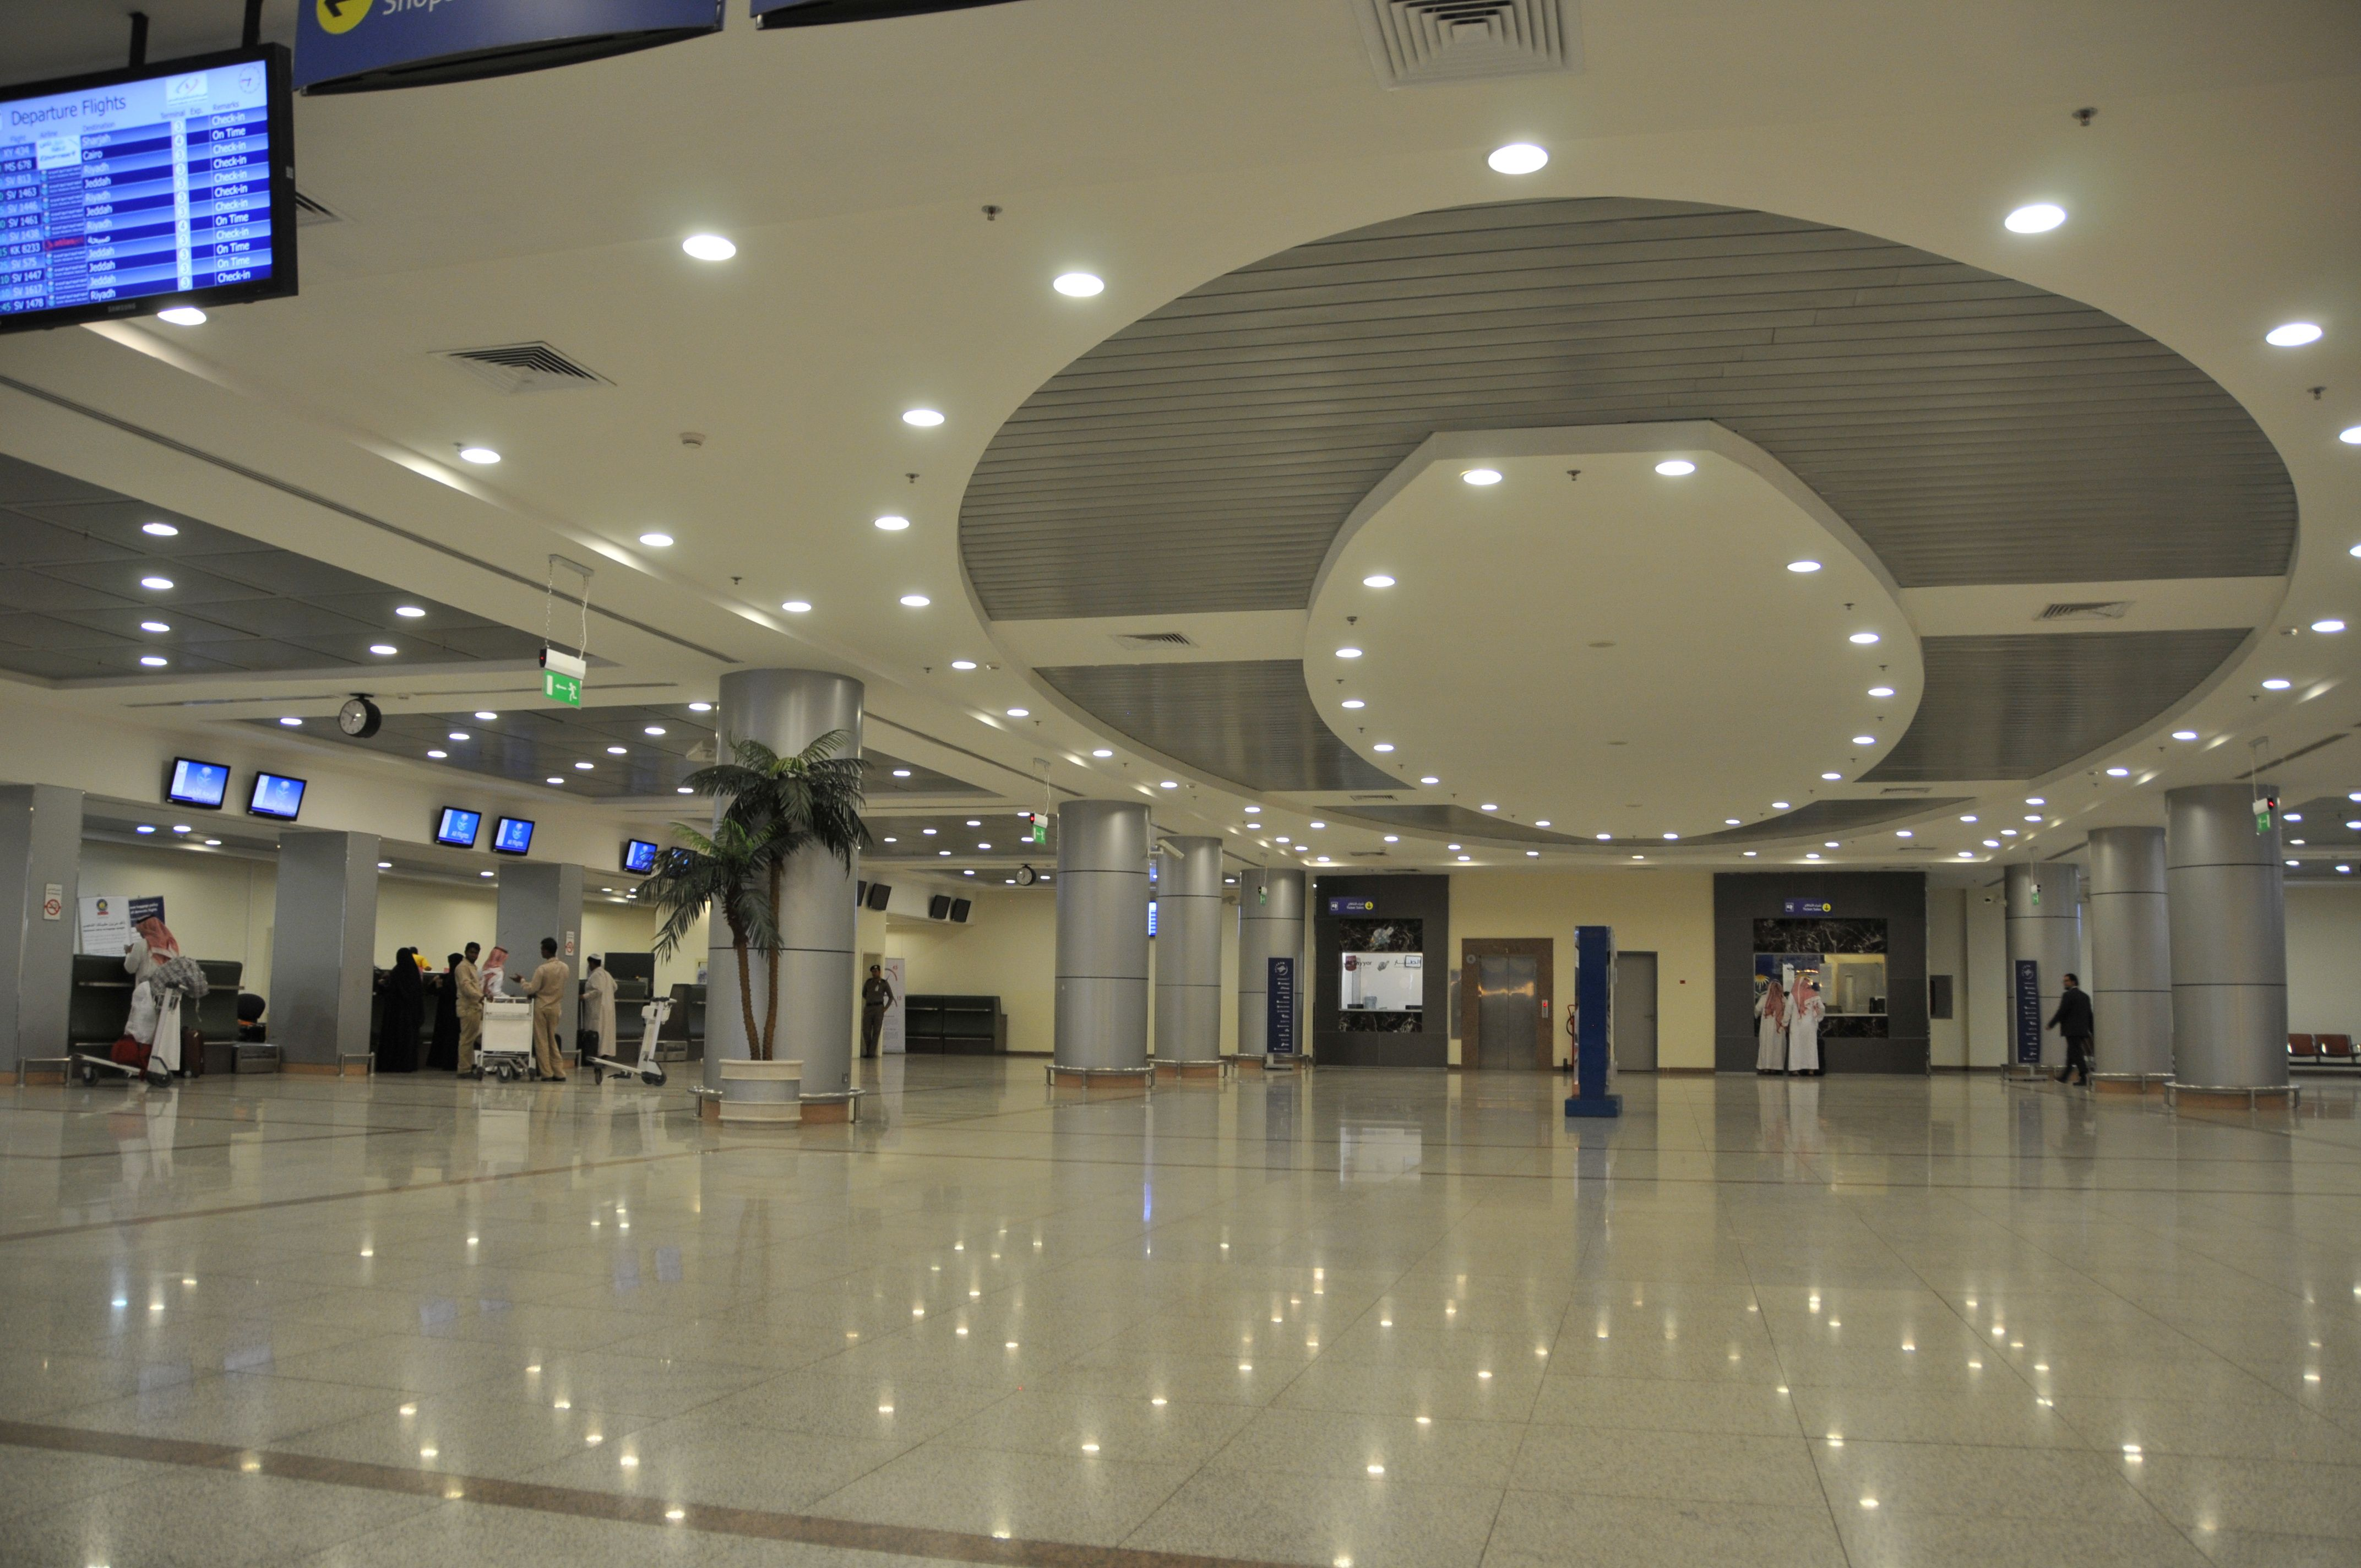 Prince Mohammad Bin Abdulaziz Airport Madinah Airport Mirror Reflection Airline Airport